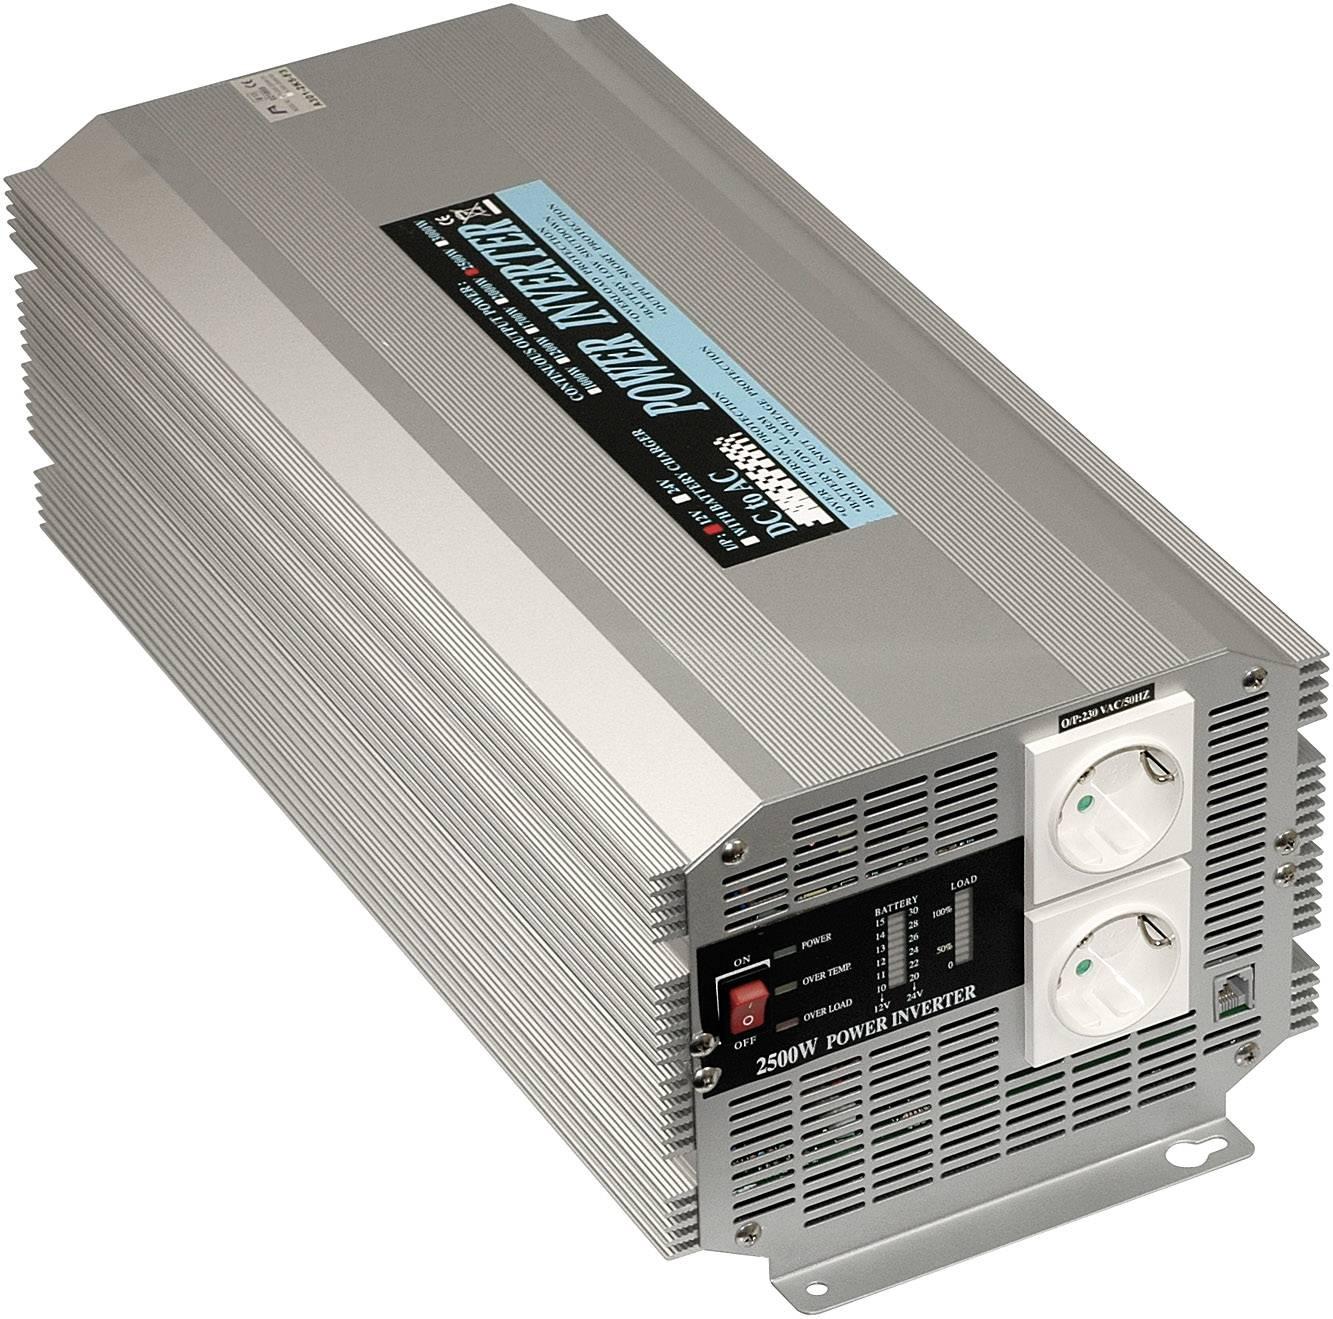 Menič napätia DC / AC Mean Well A302-2K5-F3, 2500 W, 24 V/DC/2500 W